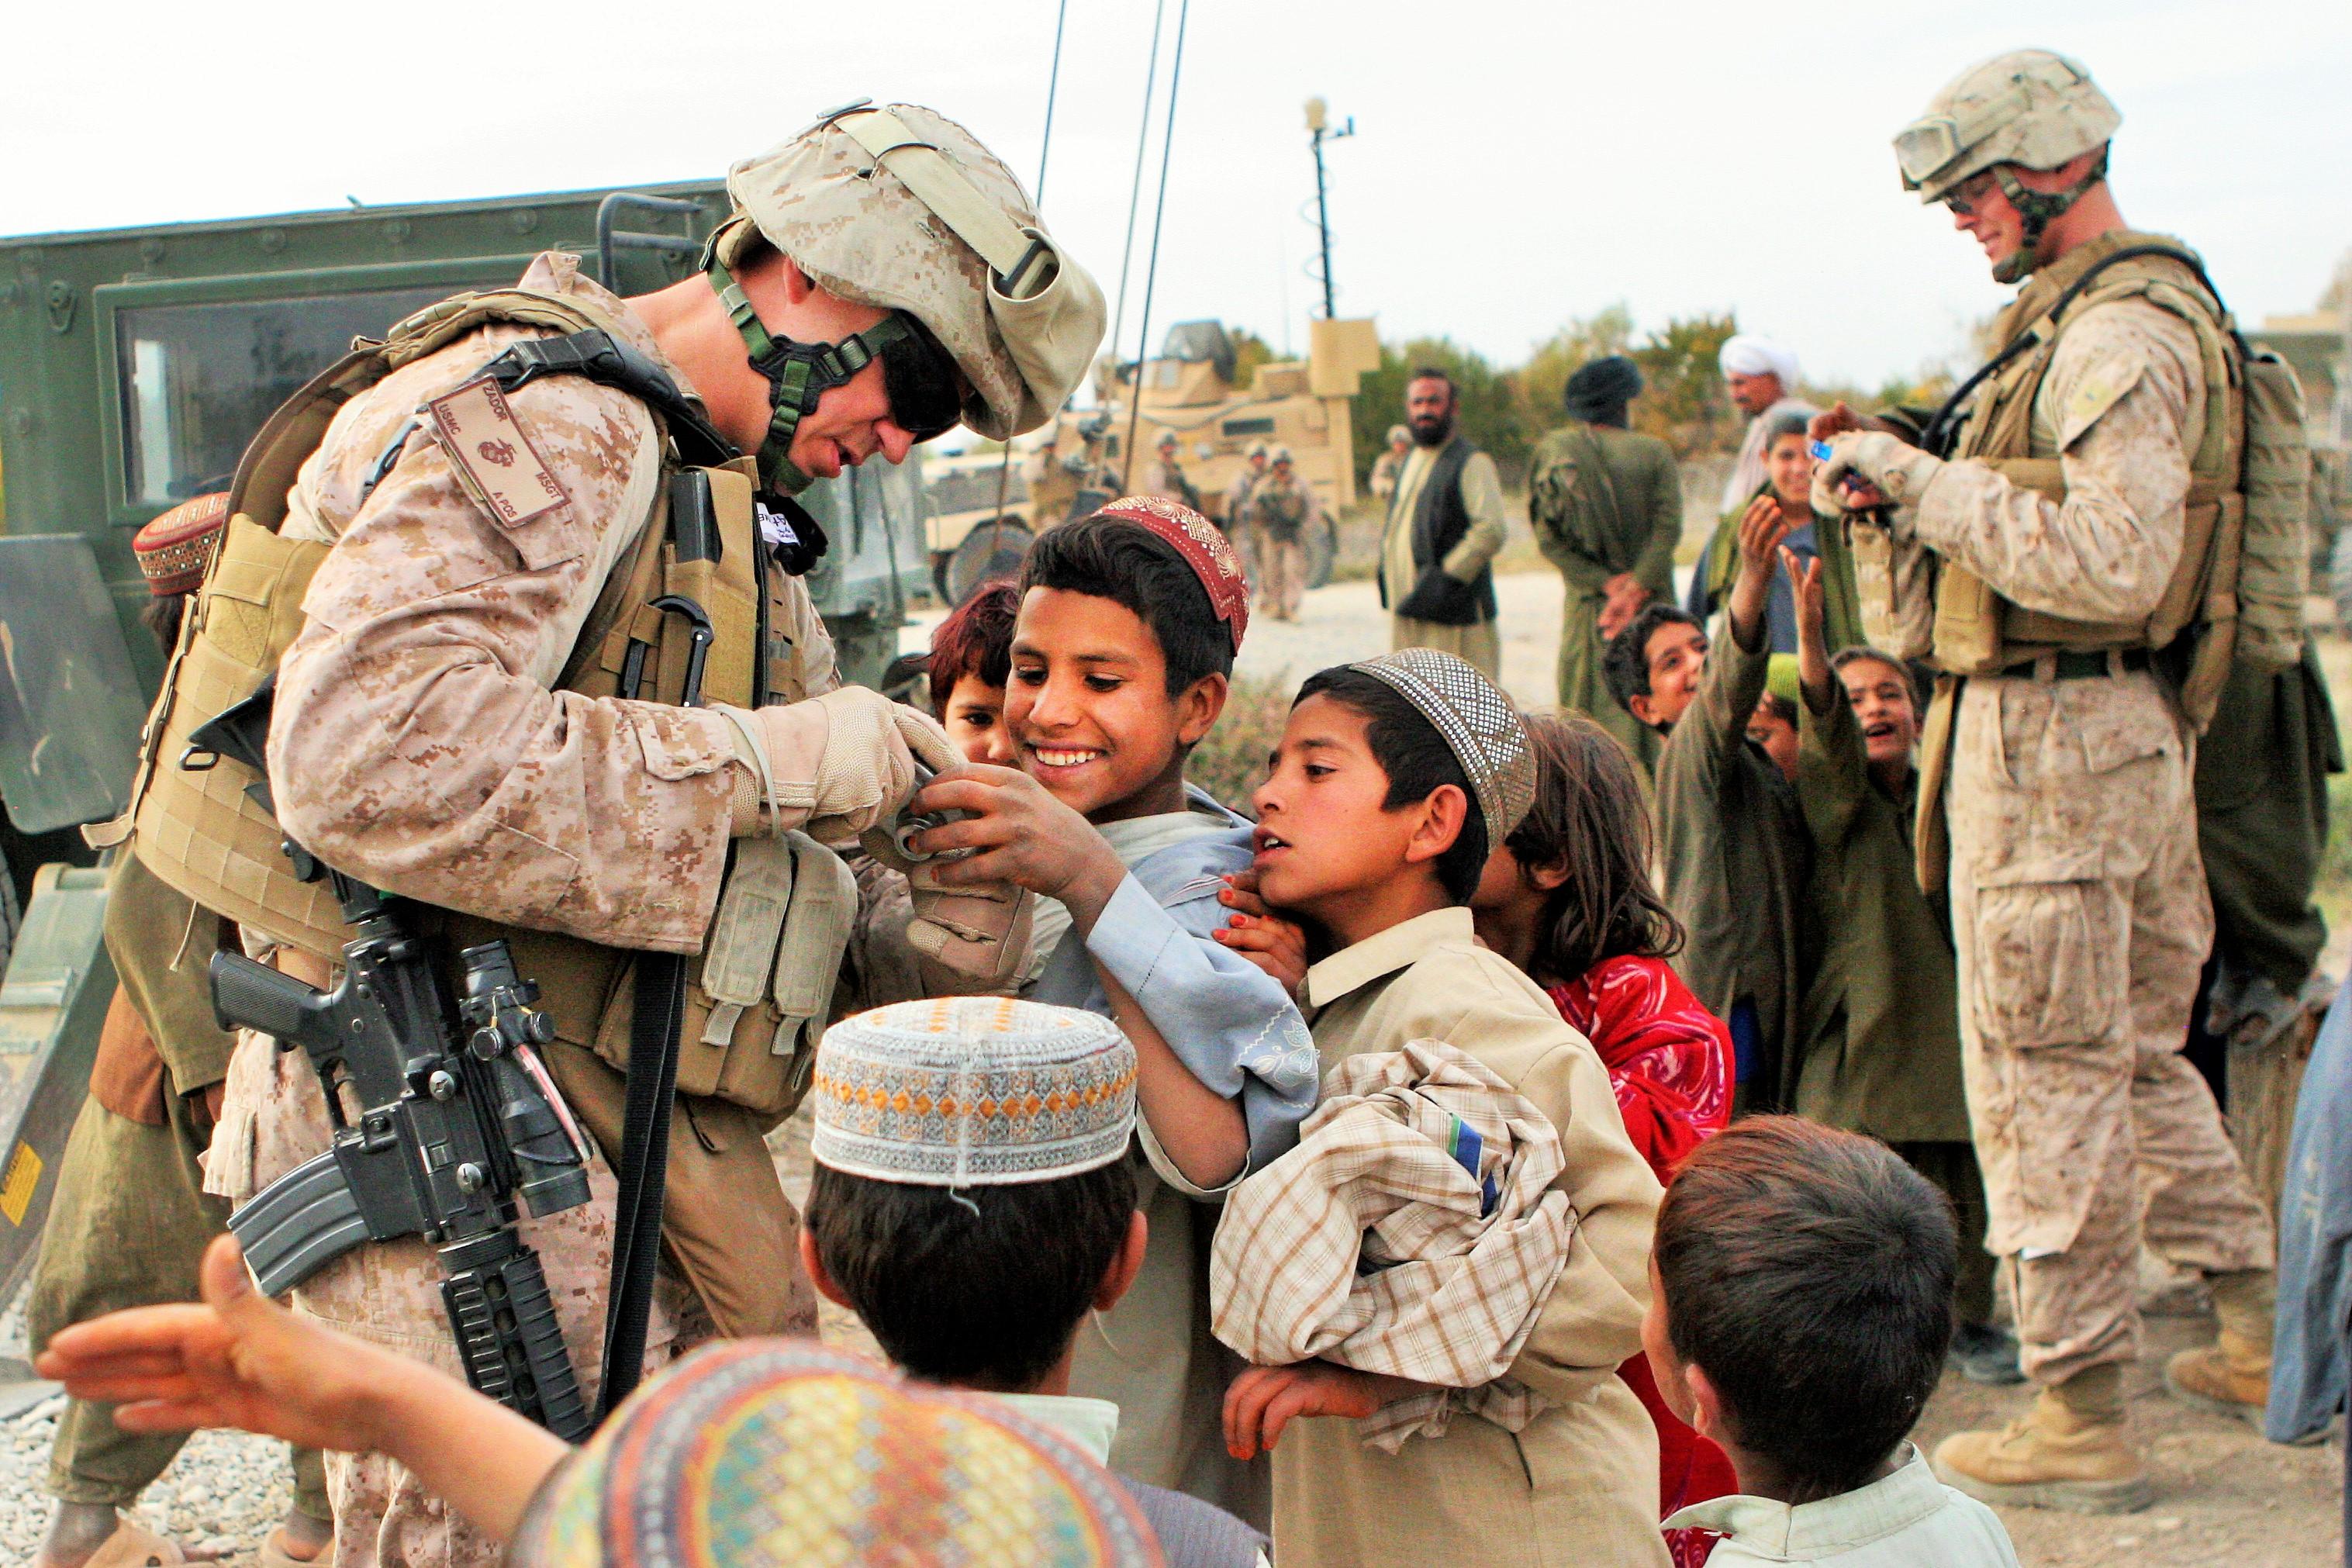 Memorial Day: Honor the Fallen, Widows, Orphans